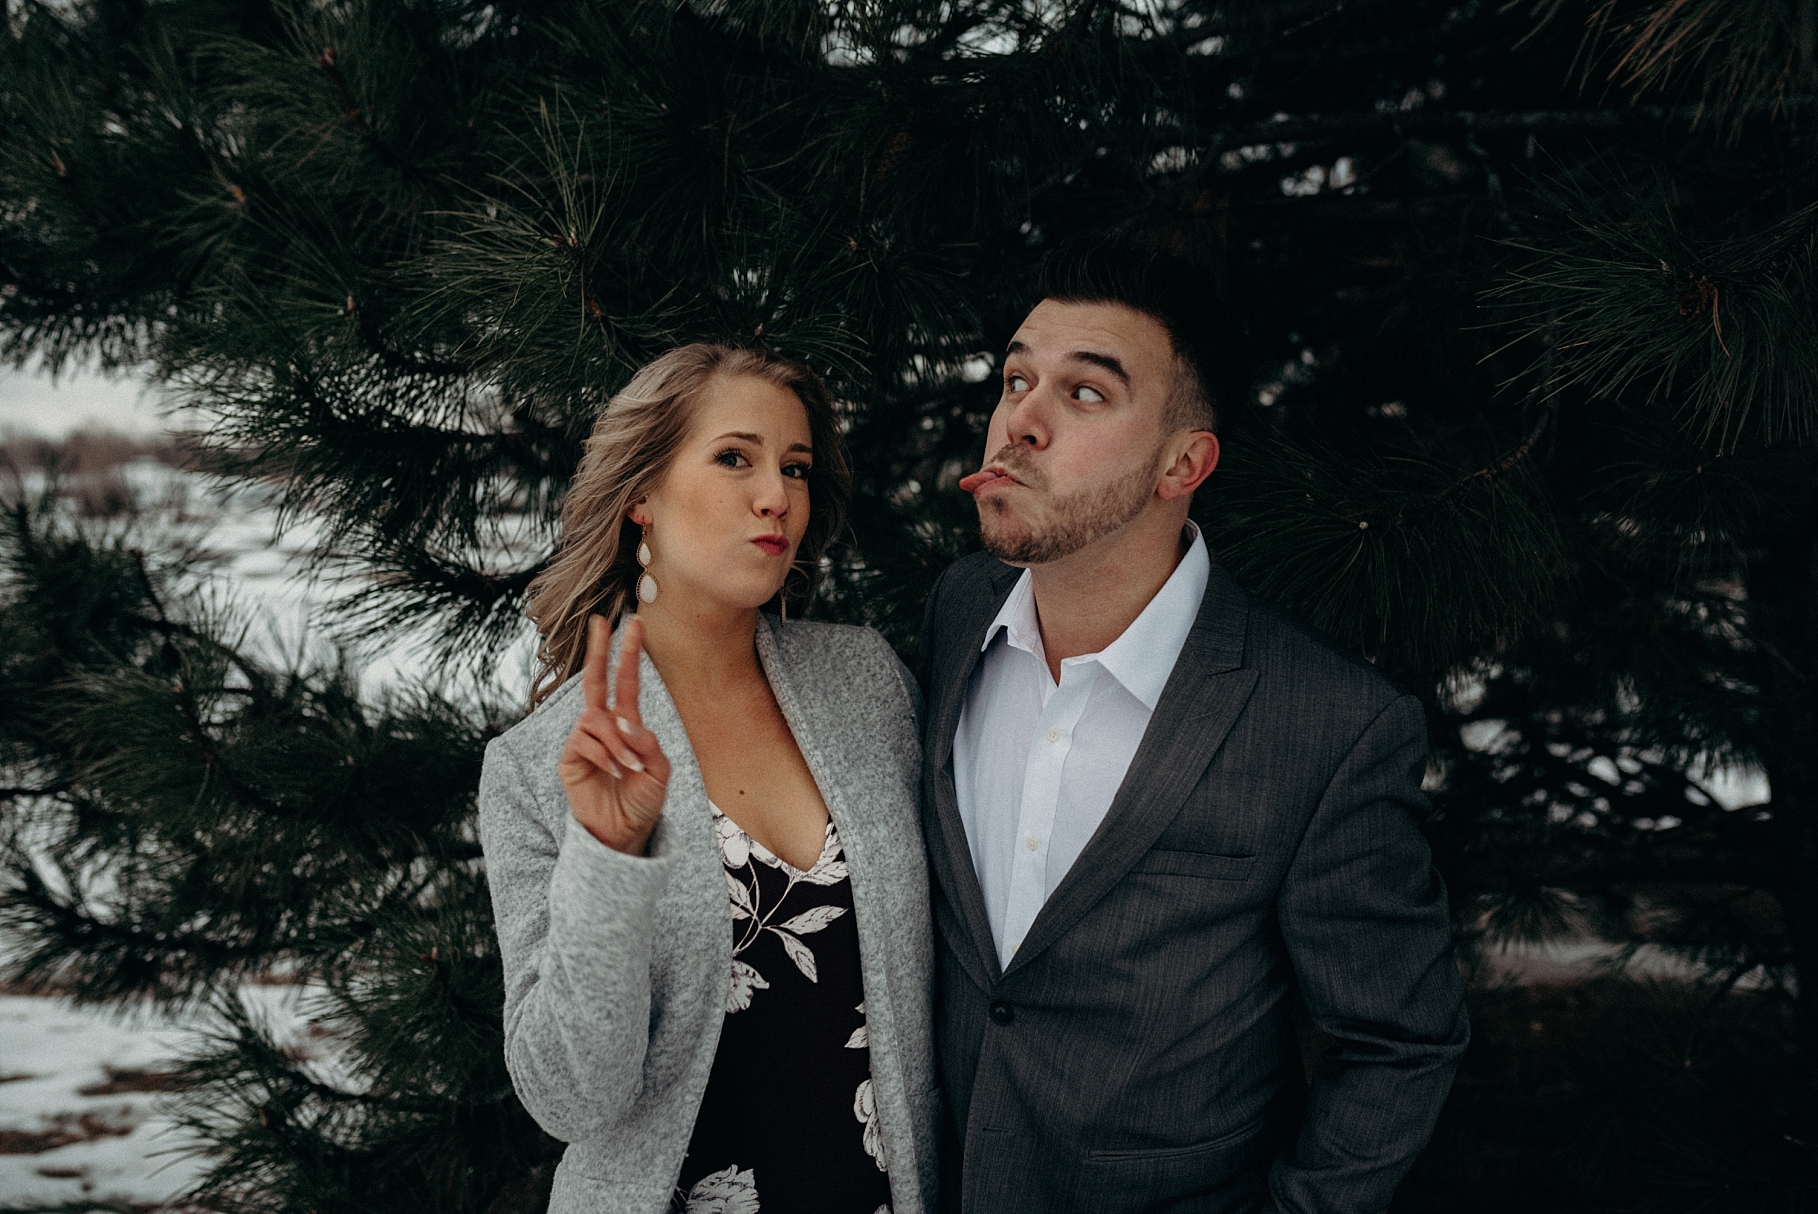 Mocha Tree Studios Ottawa Toronto Montreal Wedding and Engagement Photographer and Videographer Dark Moody Intimate Authentic Modern Romantic Cinematic Best Candid Nepean Sailing Club Andew Haydon Park 11